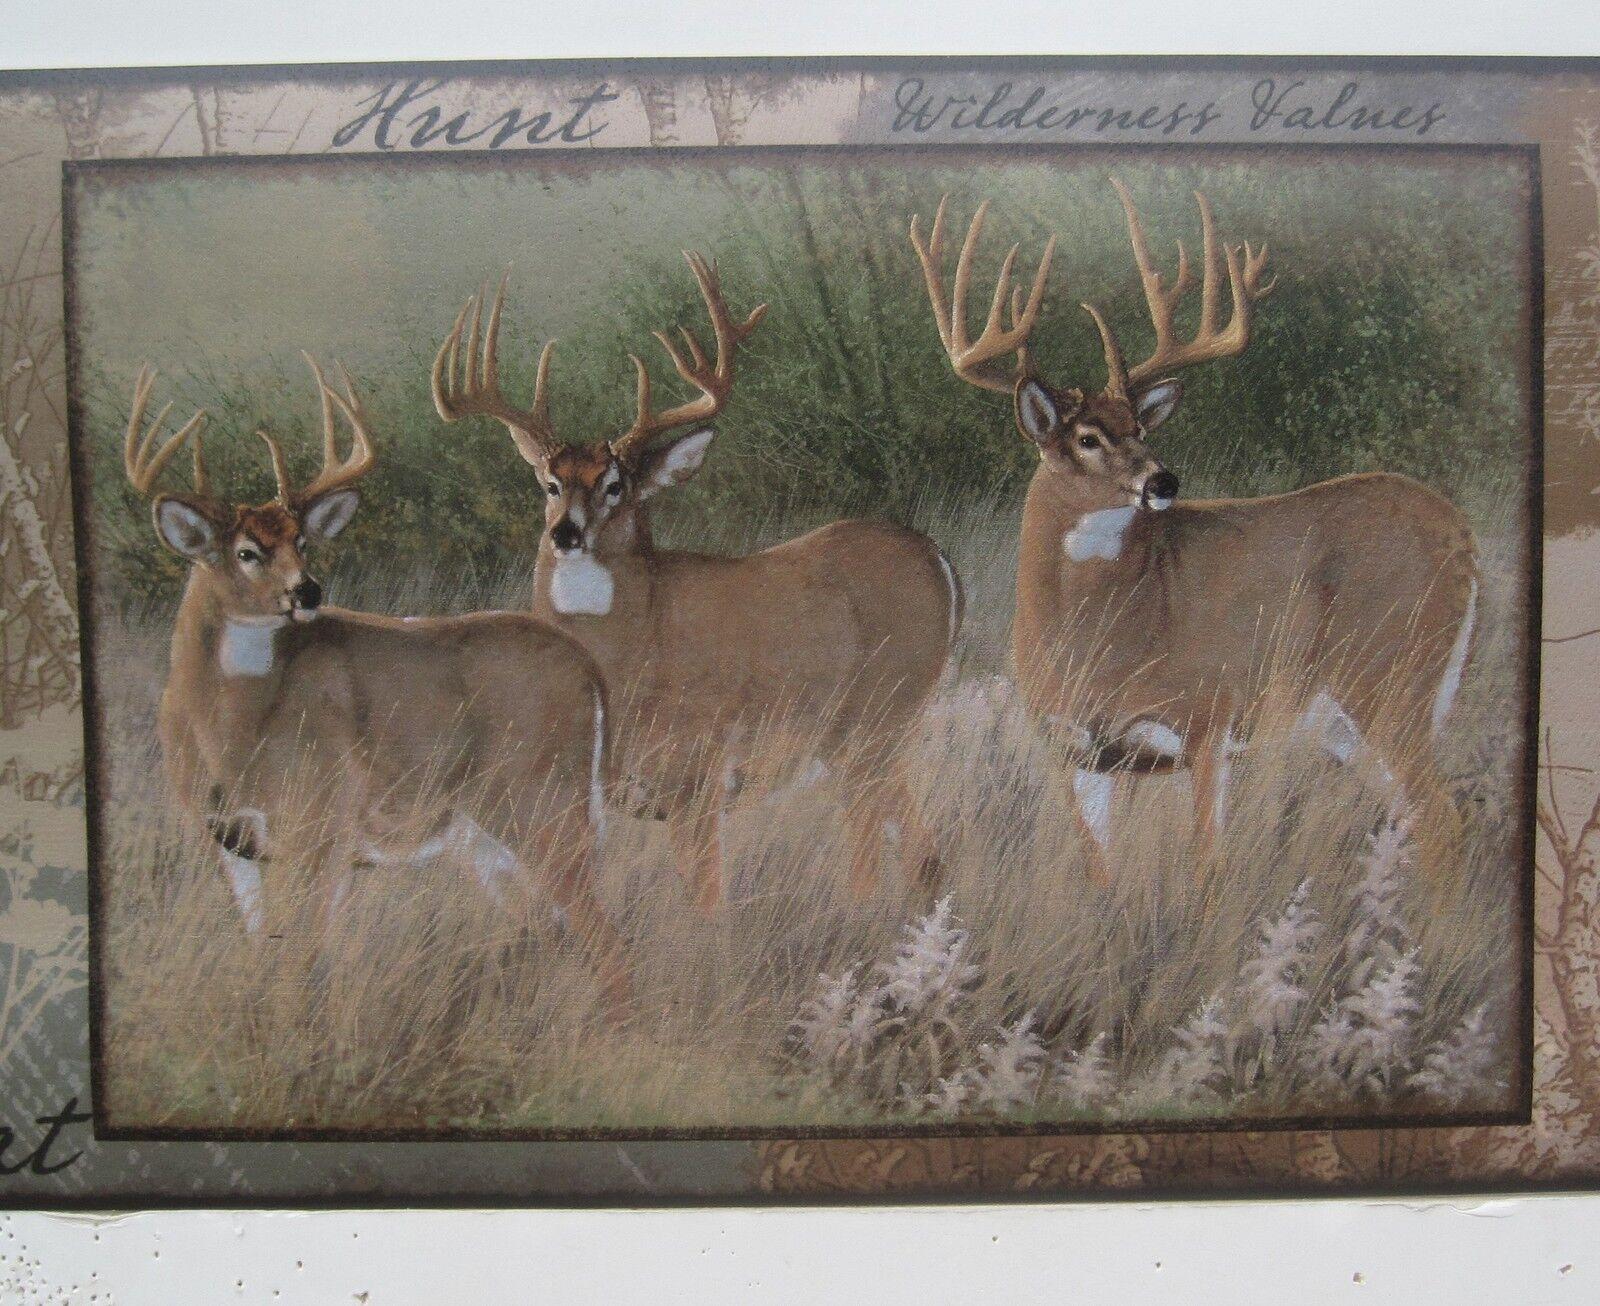 Deer Doe And Buck Hunting Wallpaper Border 8 1 2 For Sale Online Ebay